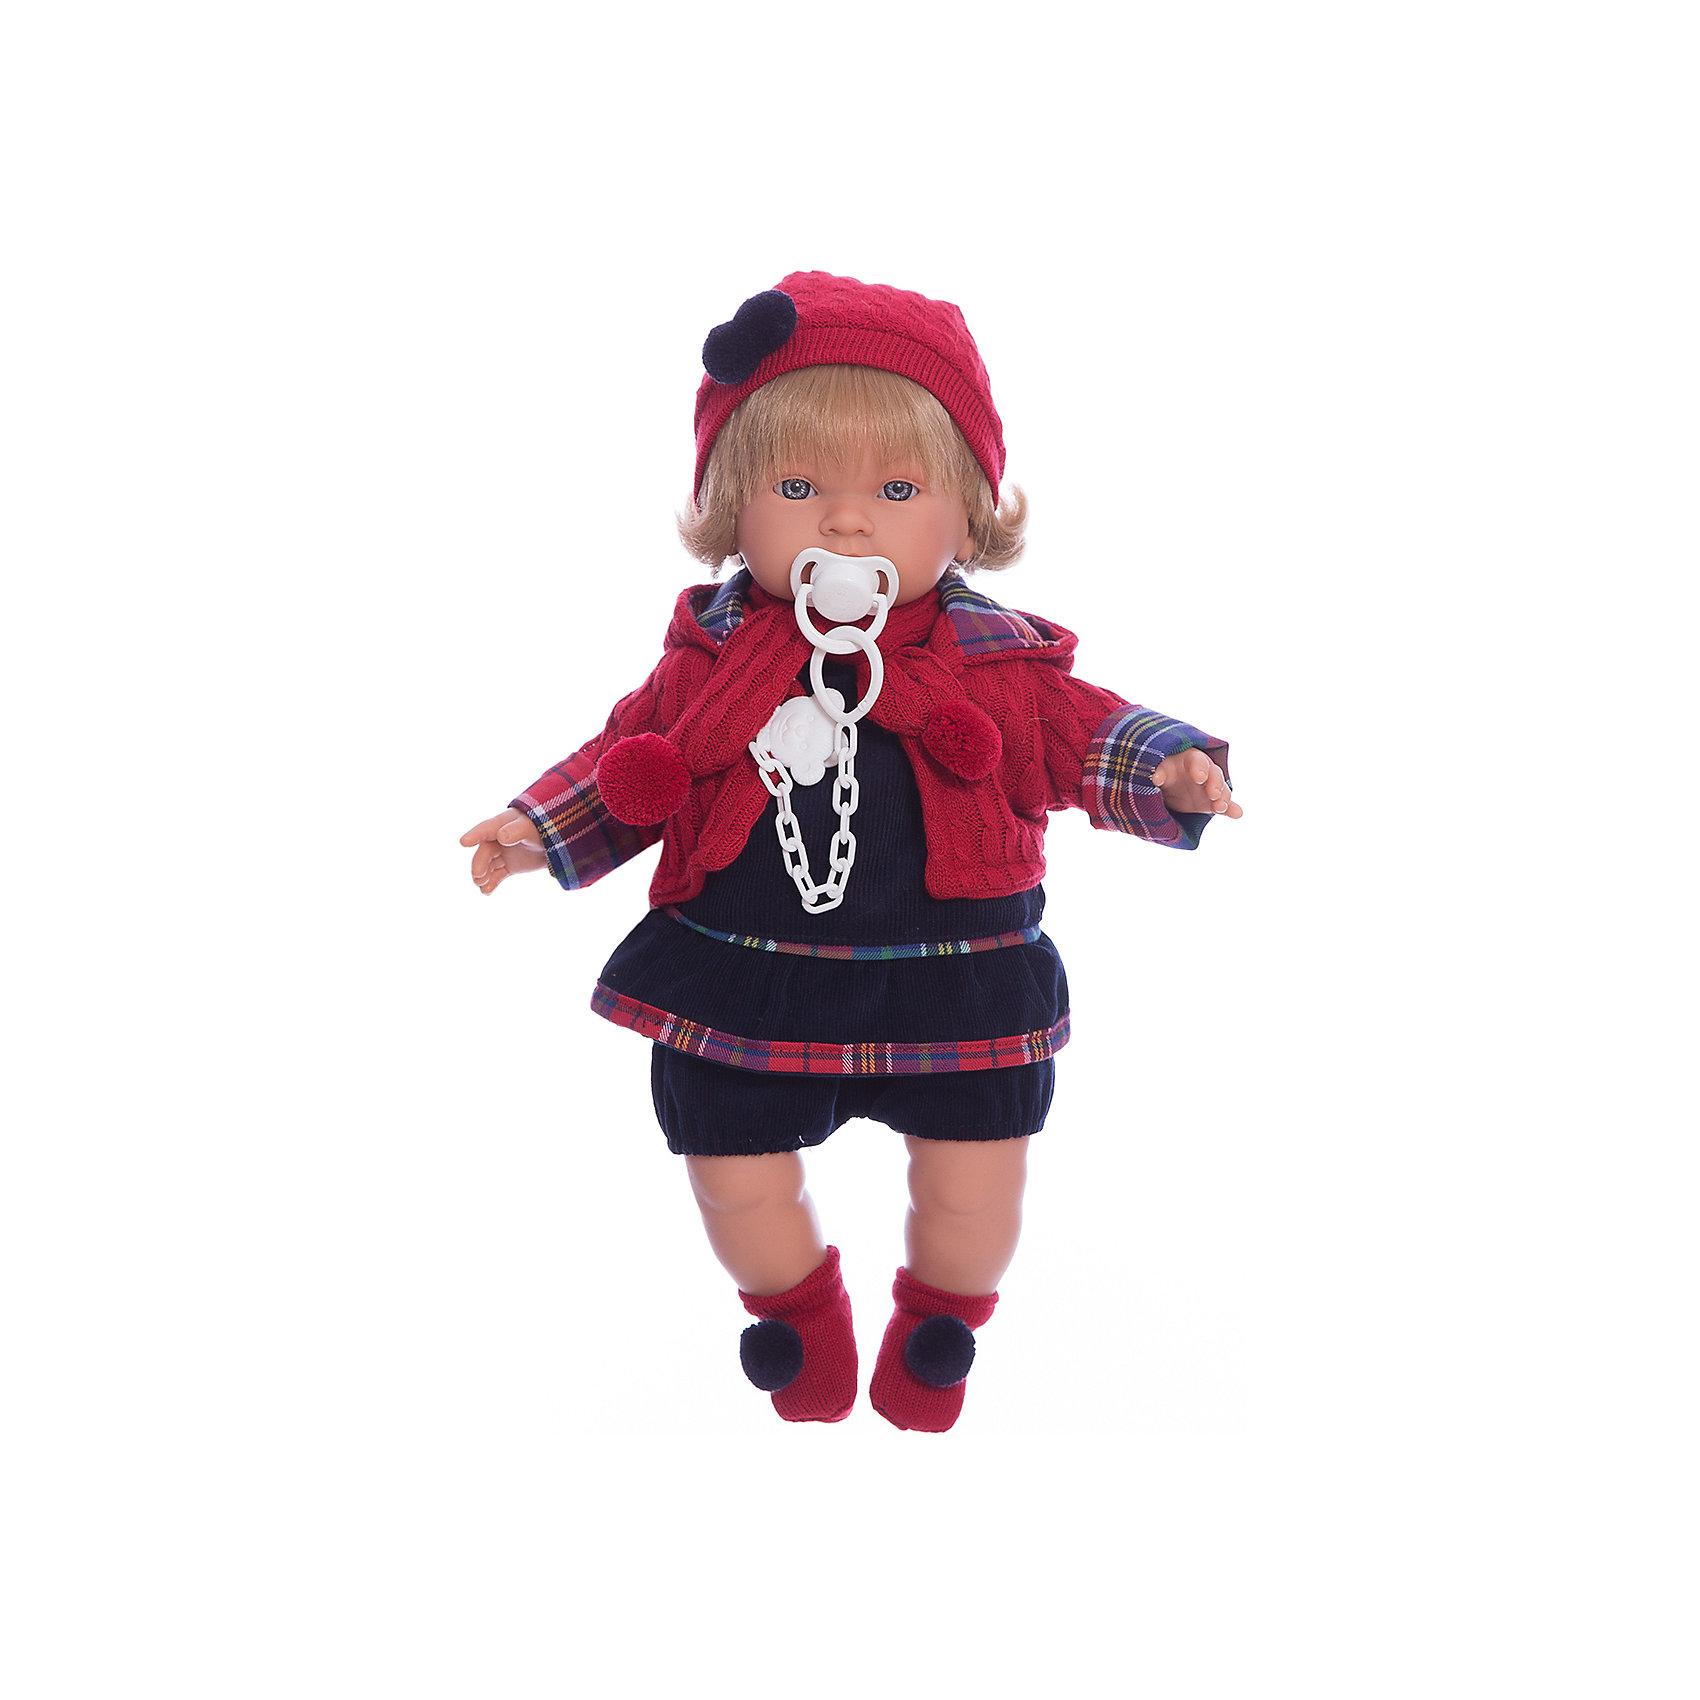 Llorens Кукла Марина, 42 см, Llorens куклы и одежда для кукол llorens кукла изабела 33 см со звуком